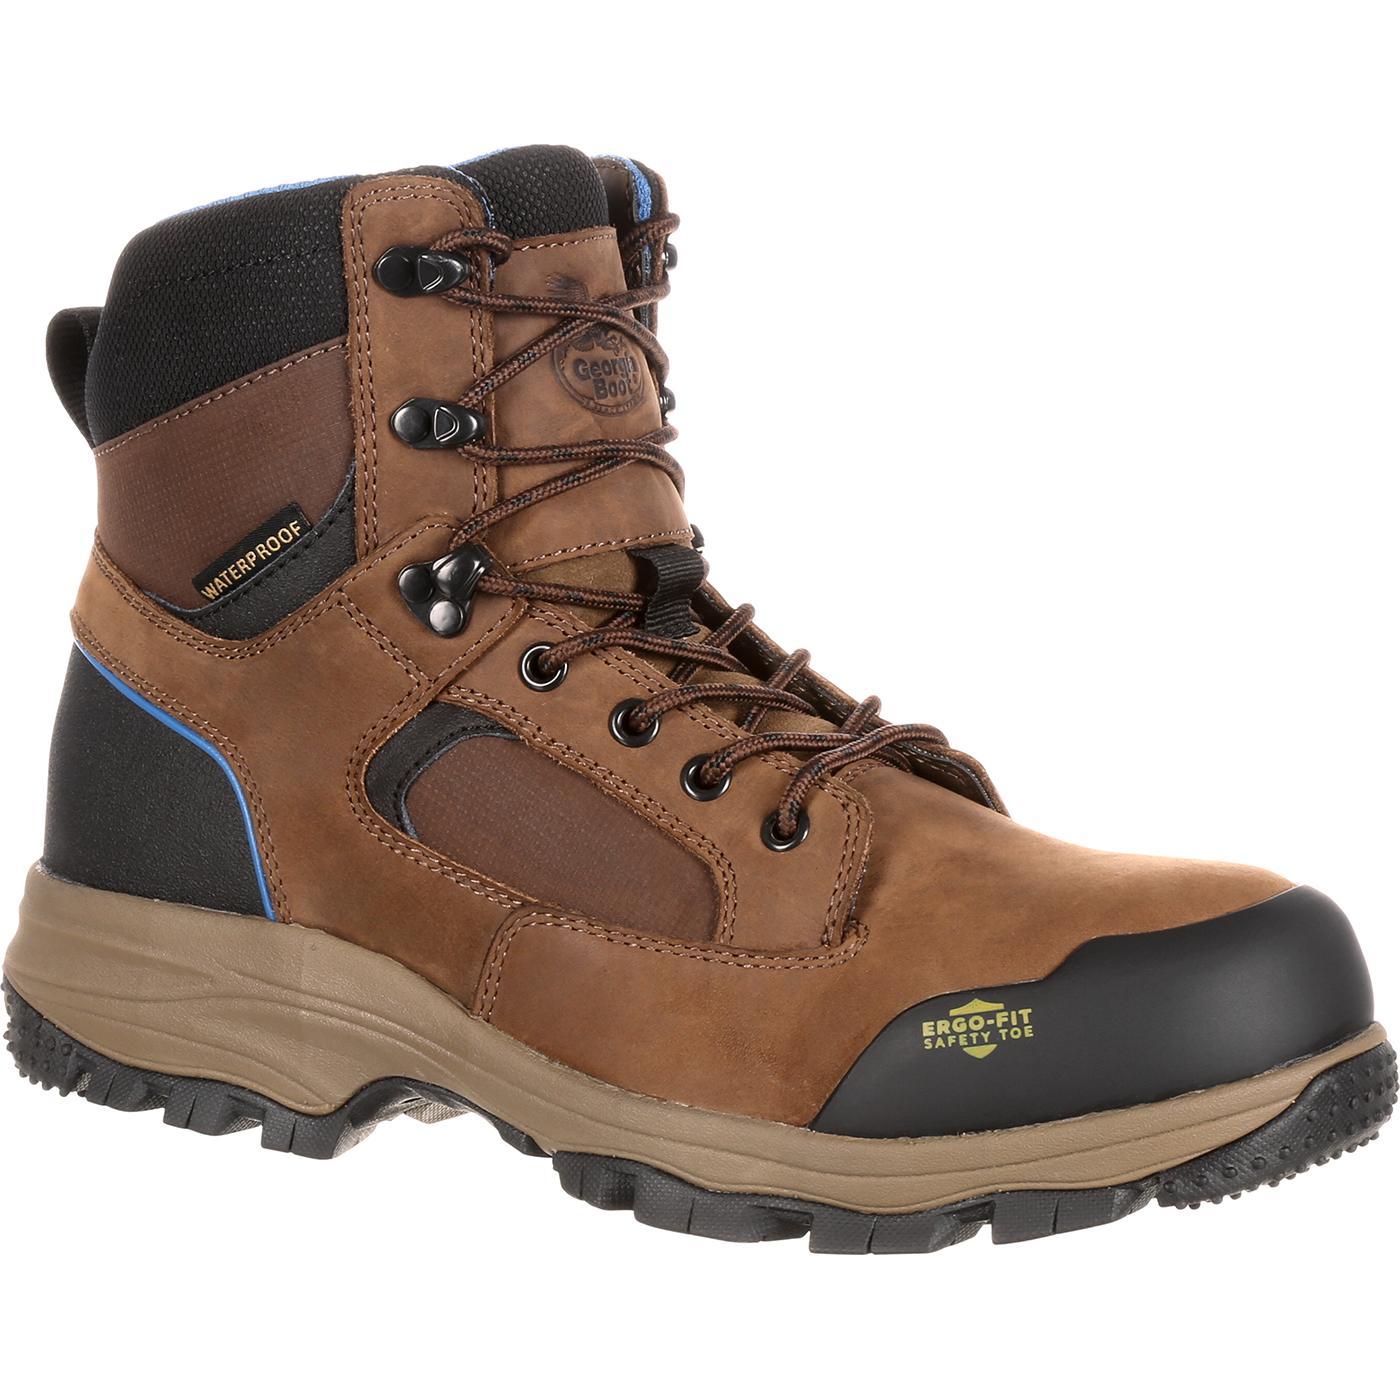 Georgia Boot Blue Collar Comfortable Waterproof Work Hiker